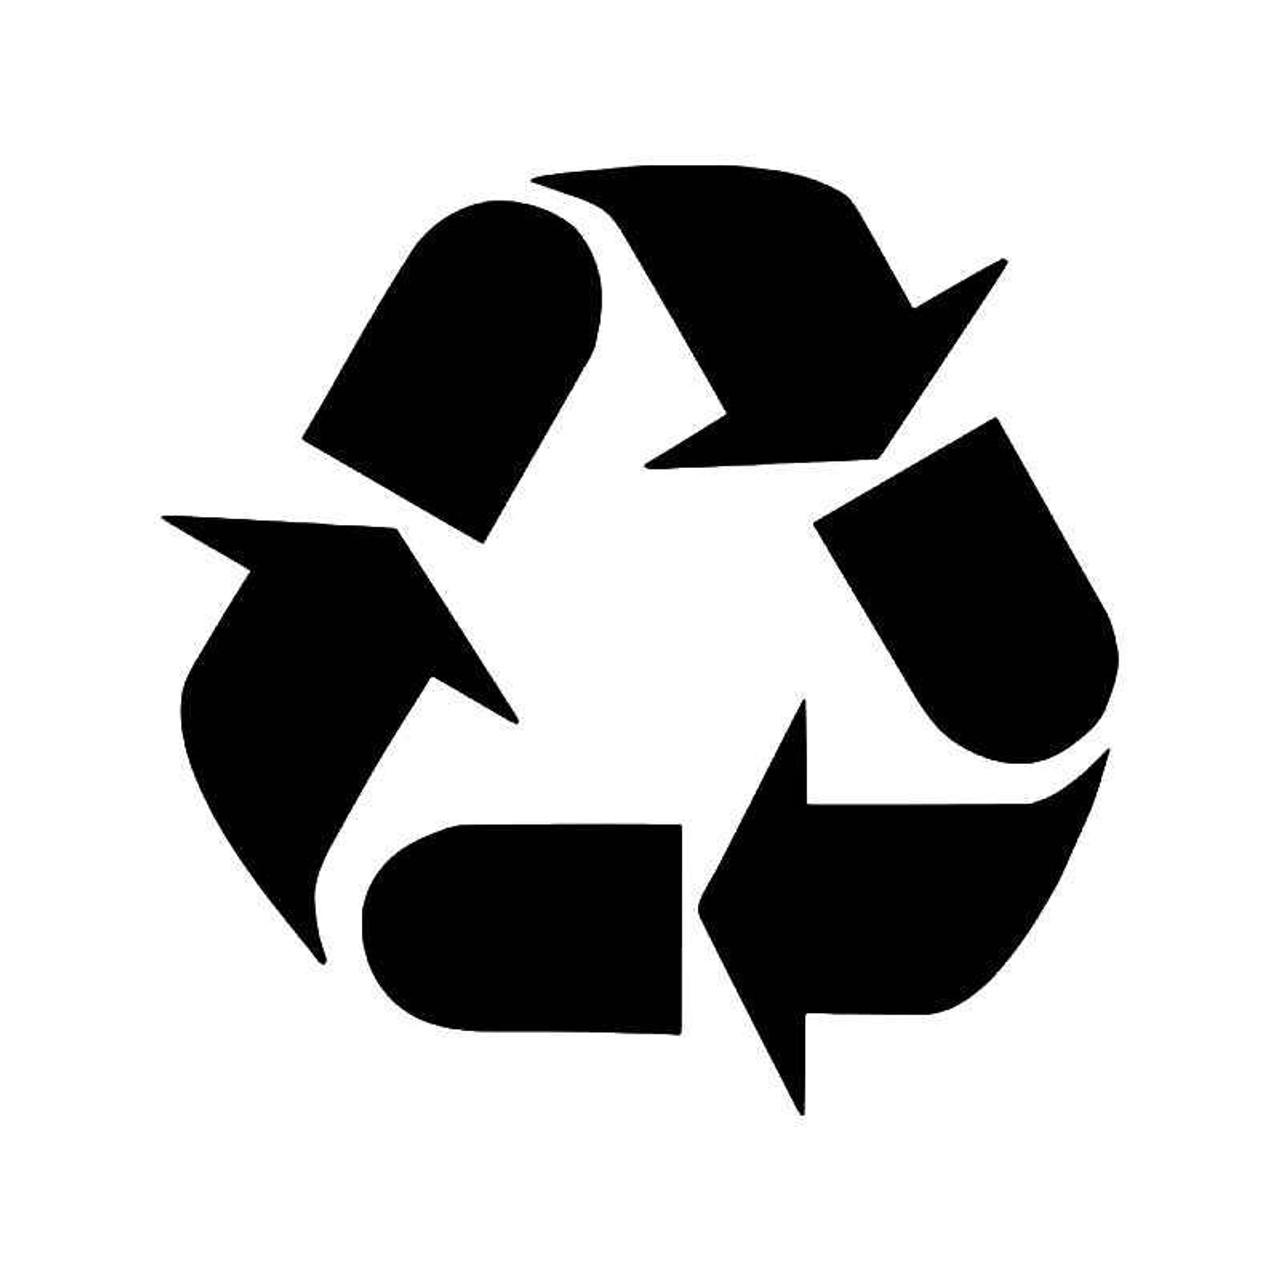 Recycle Trash Symbol 1 Vinyl Sticker